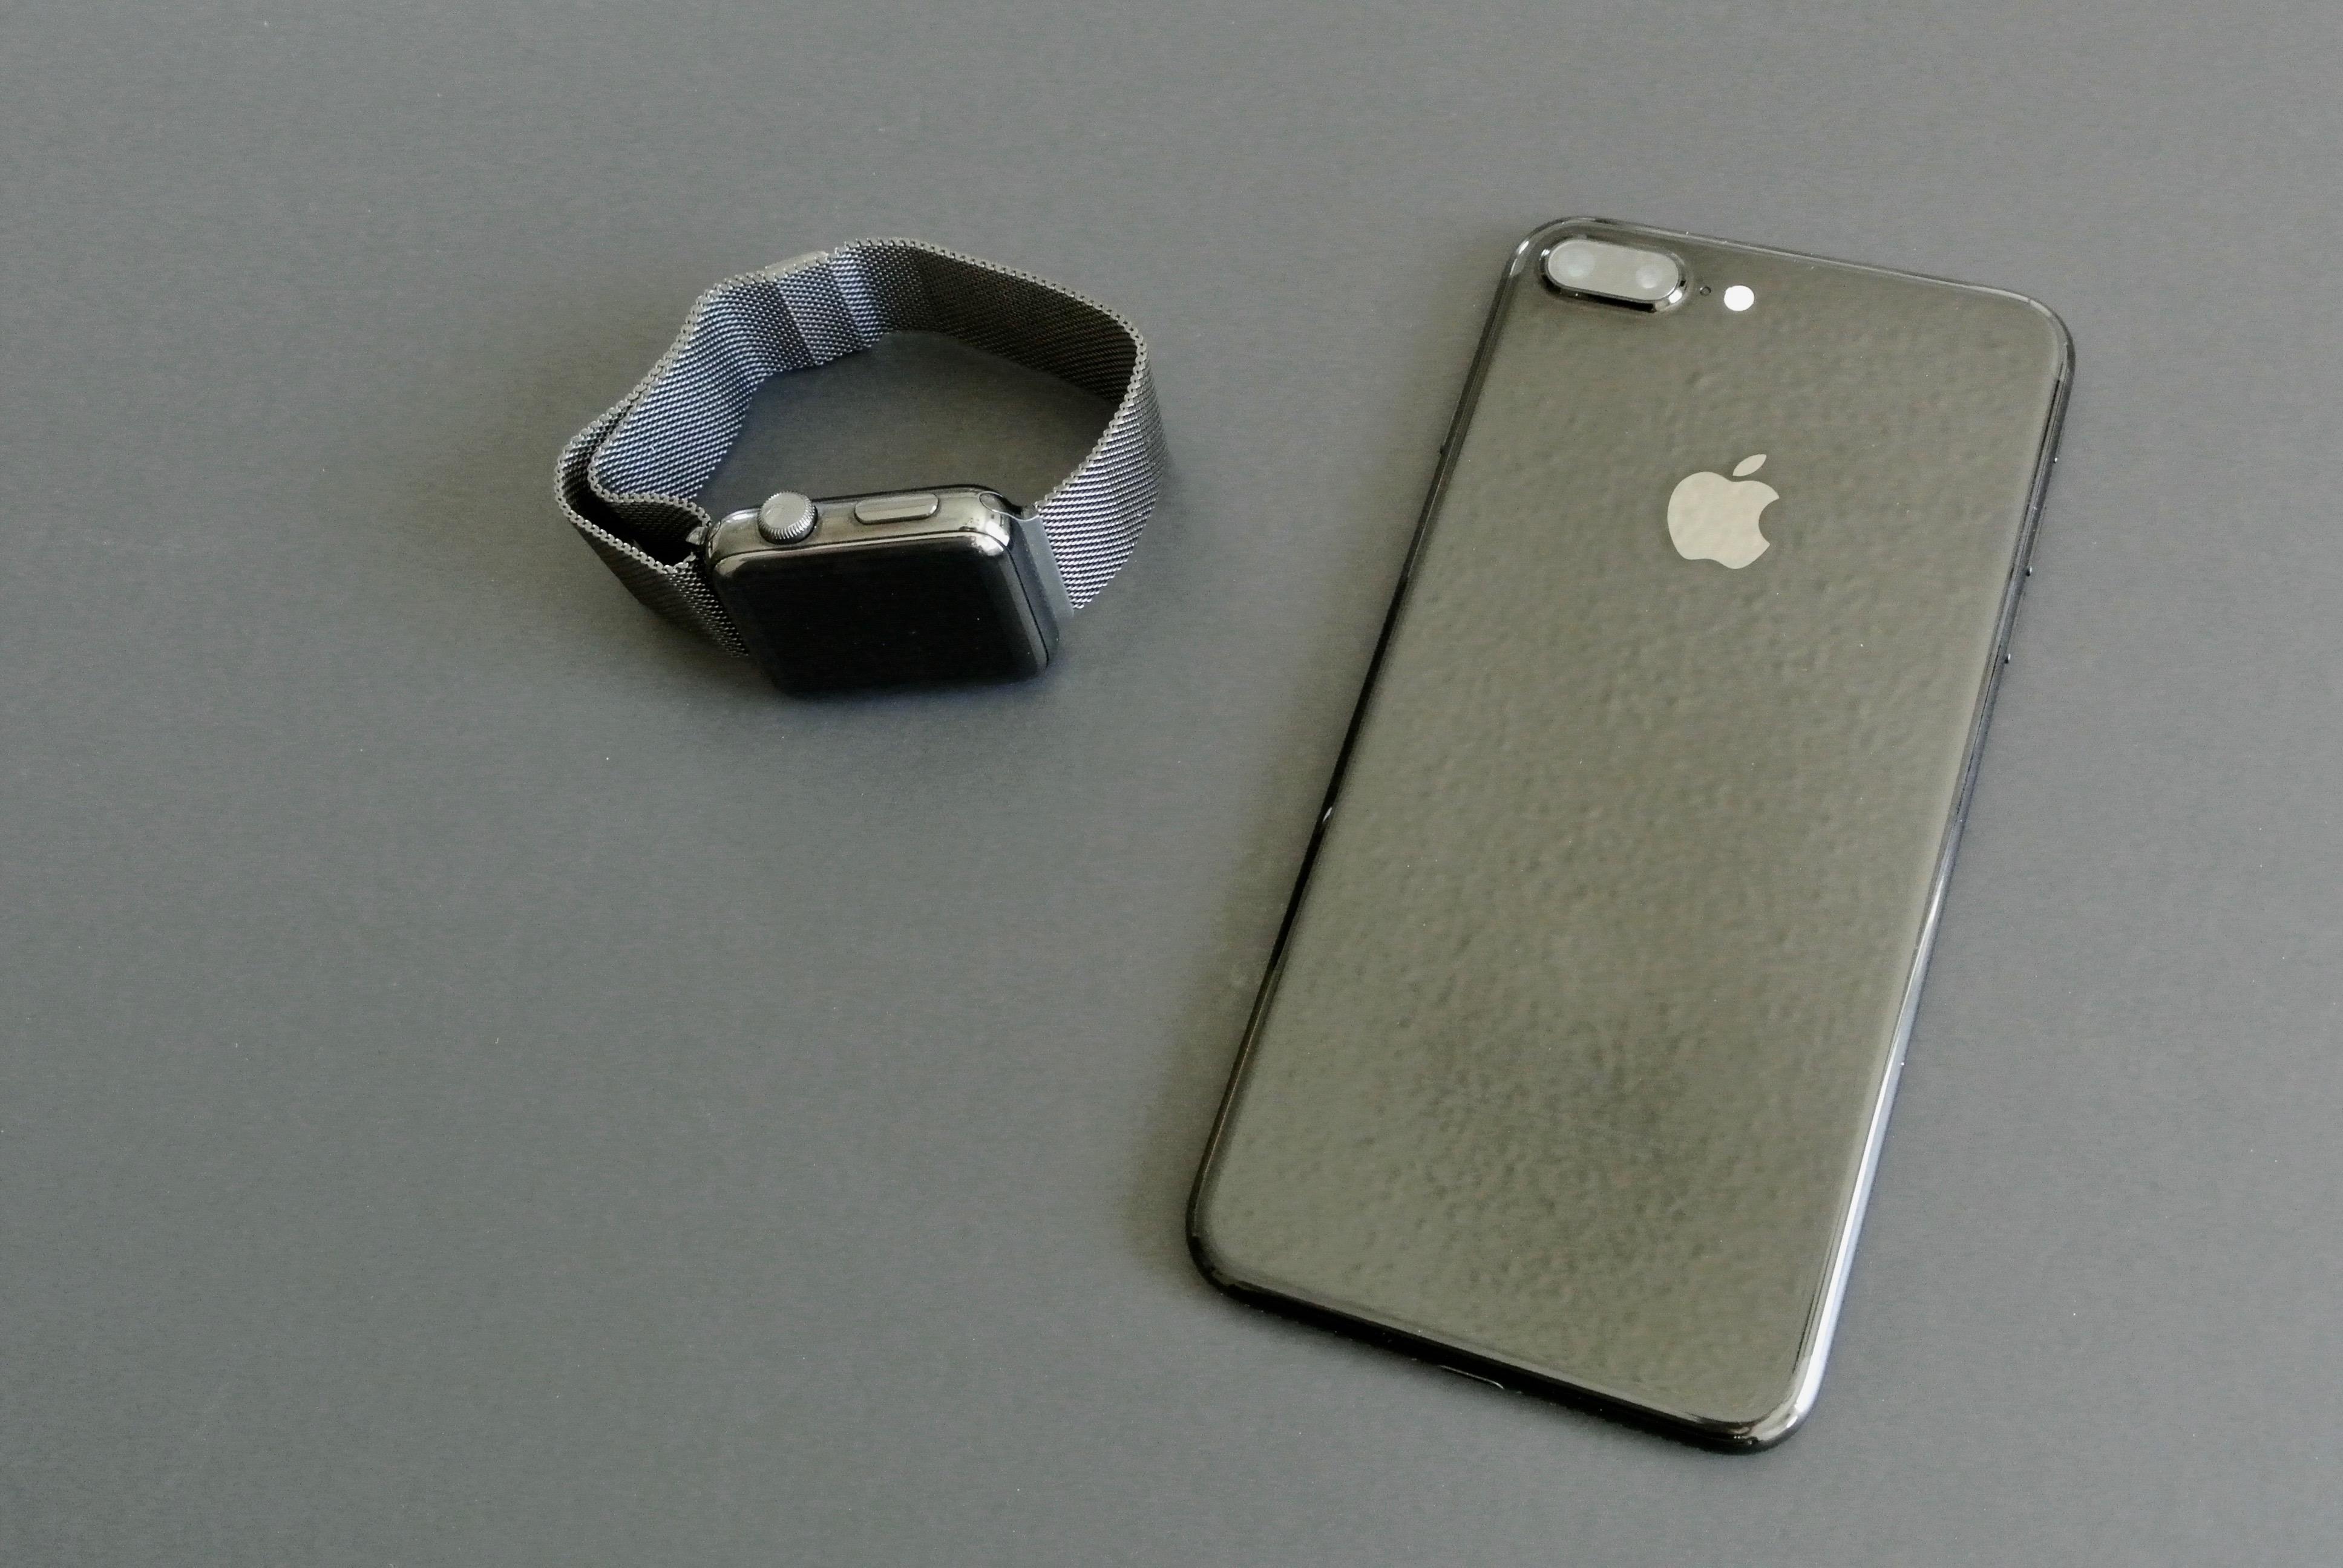 iPhone 7 jet black vs apple watch space black 4